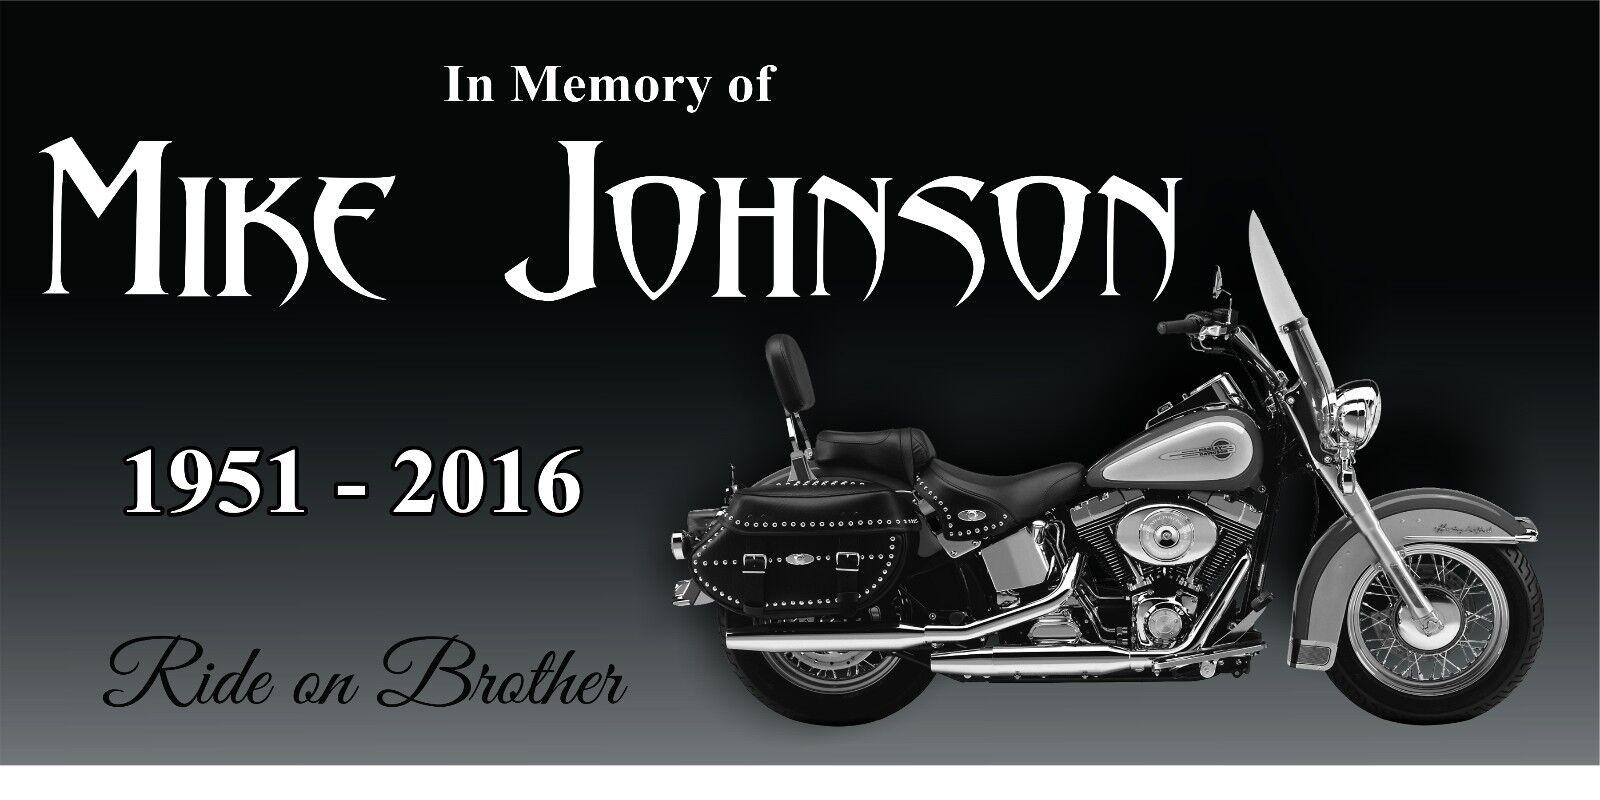 Personalized Pet Stone Memorial Grave Marker Granite Human People Motorcycle